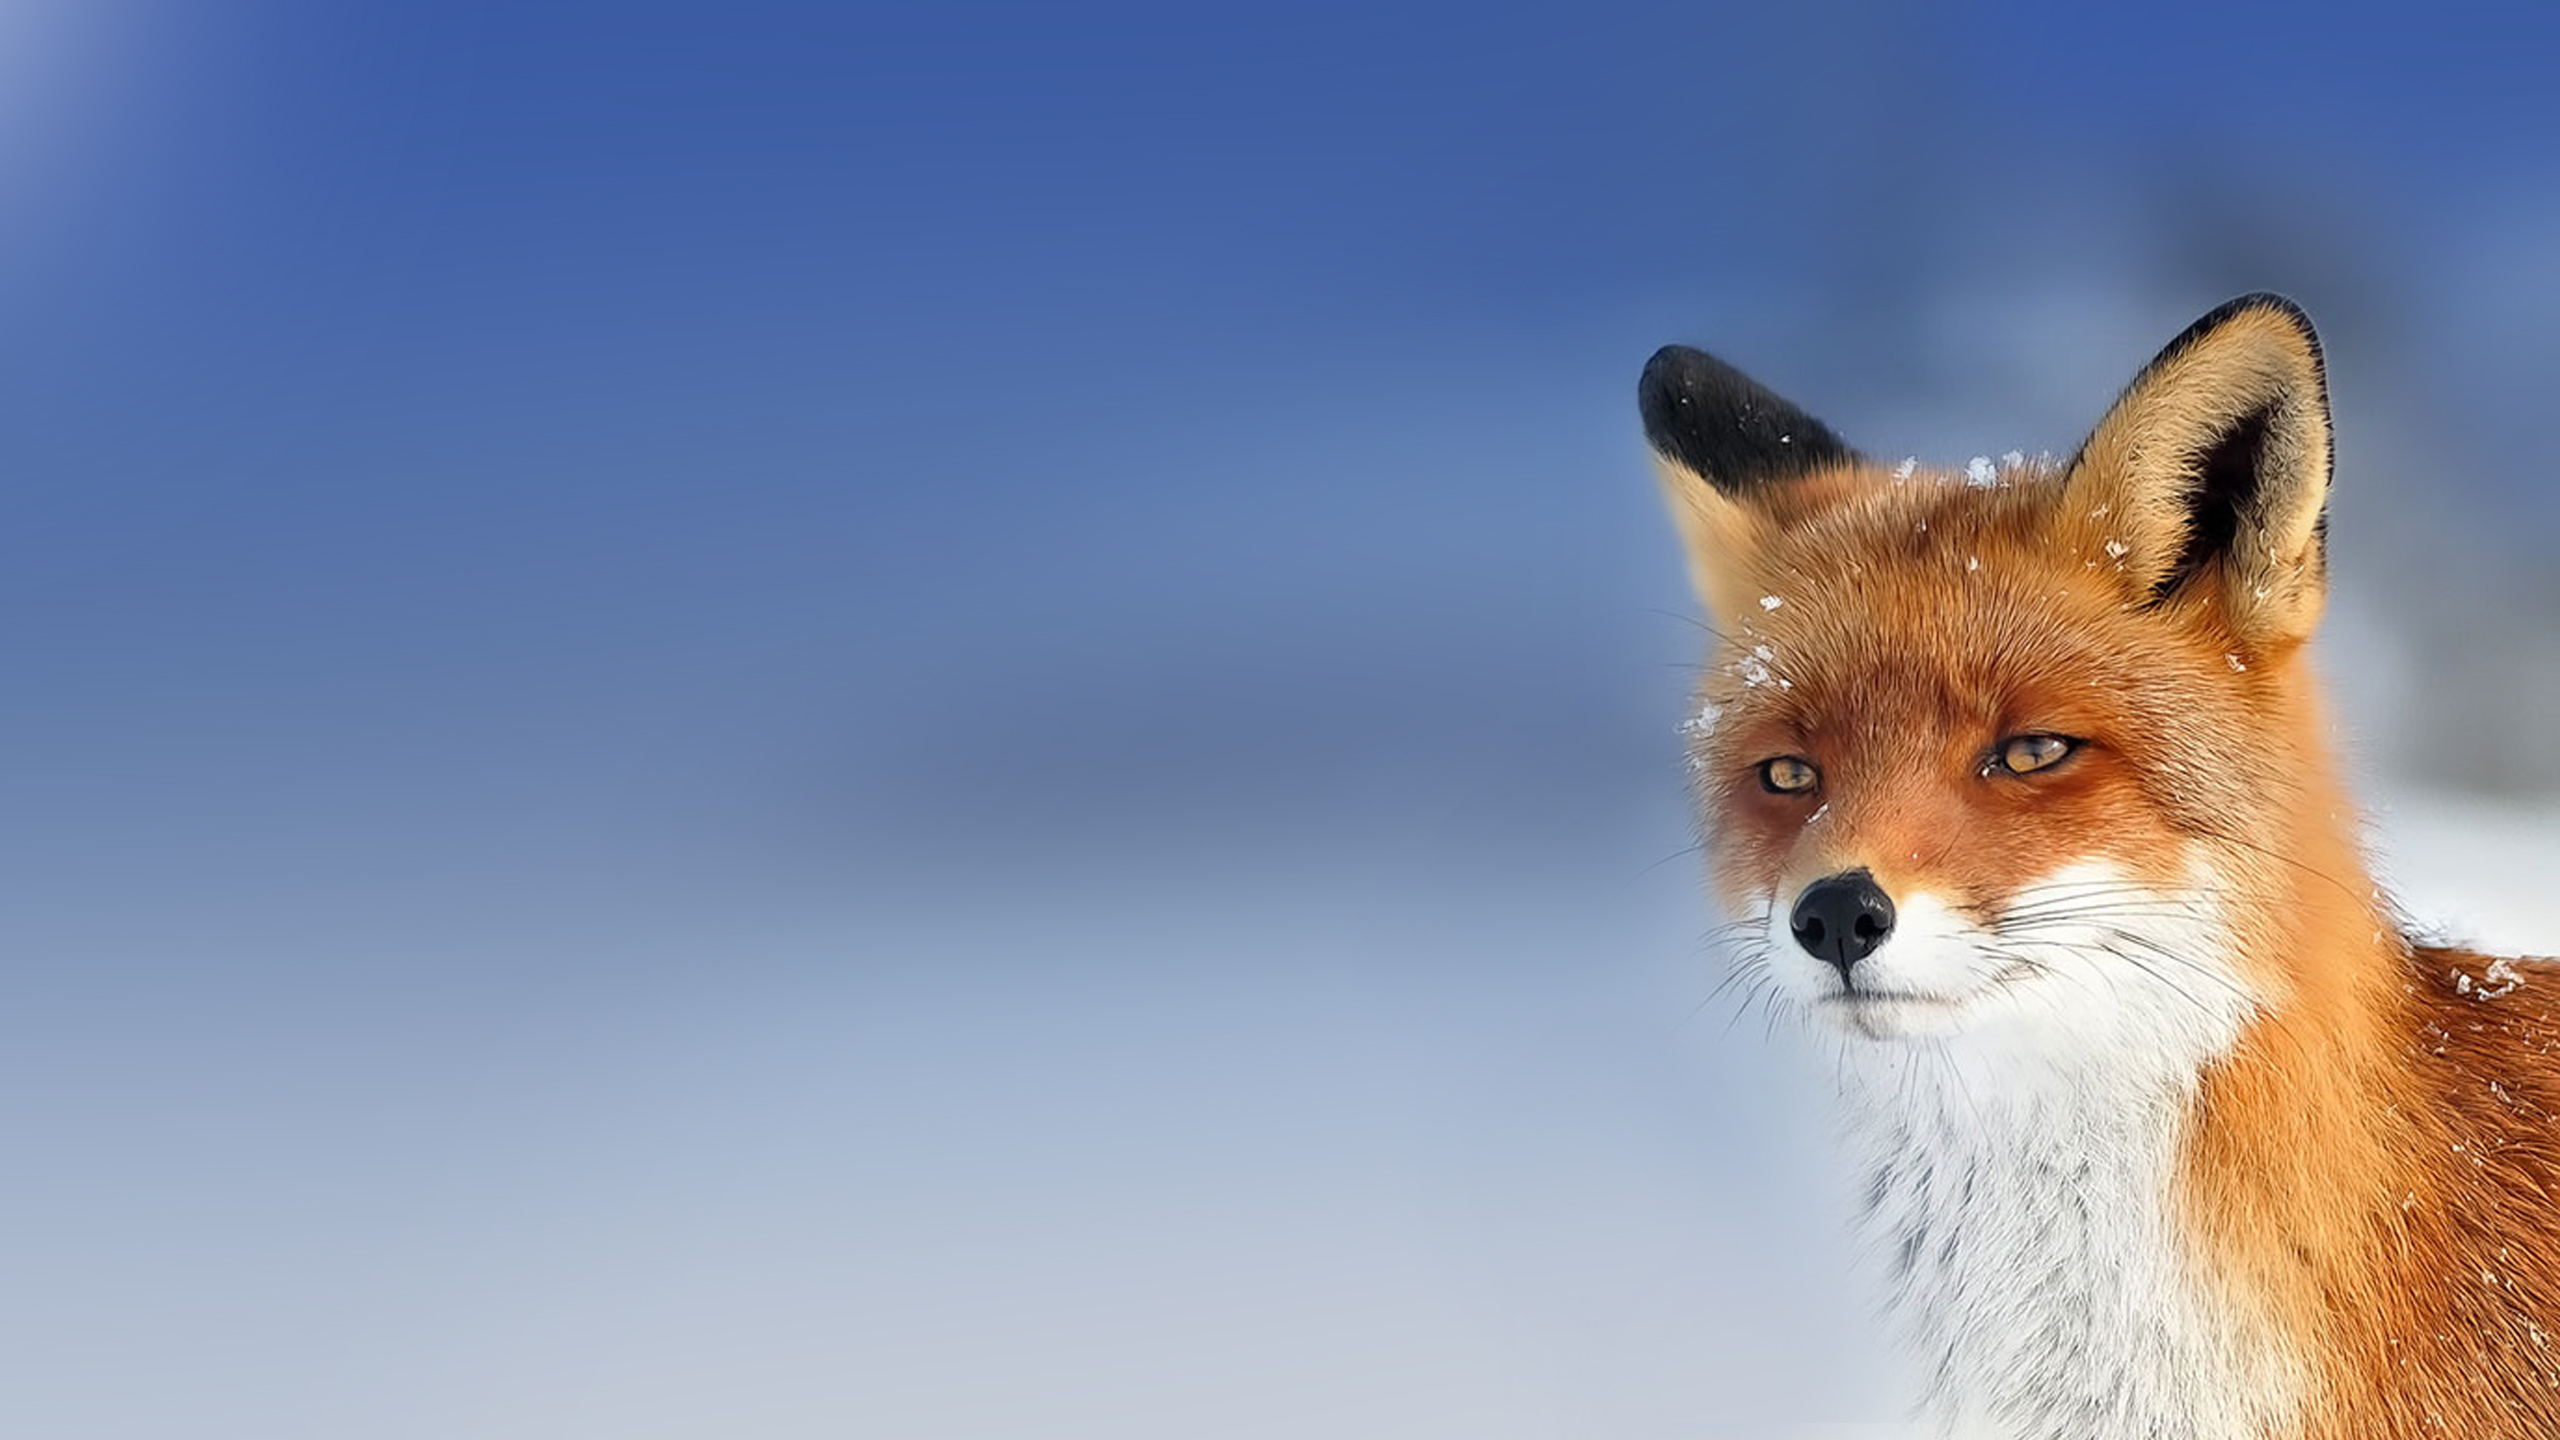 wallpaper fox resize 2560x1440 by povcam on deviantart